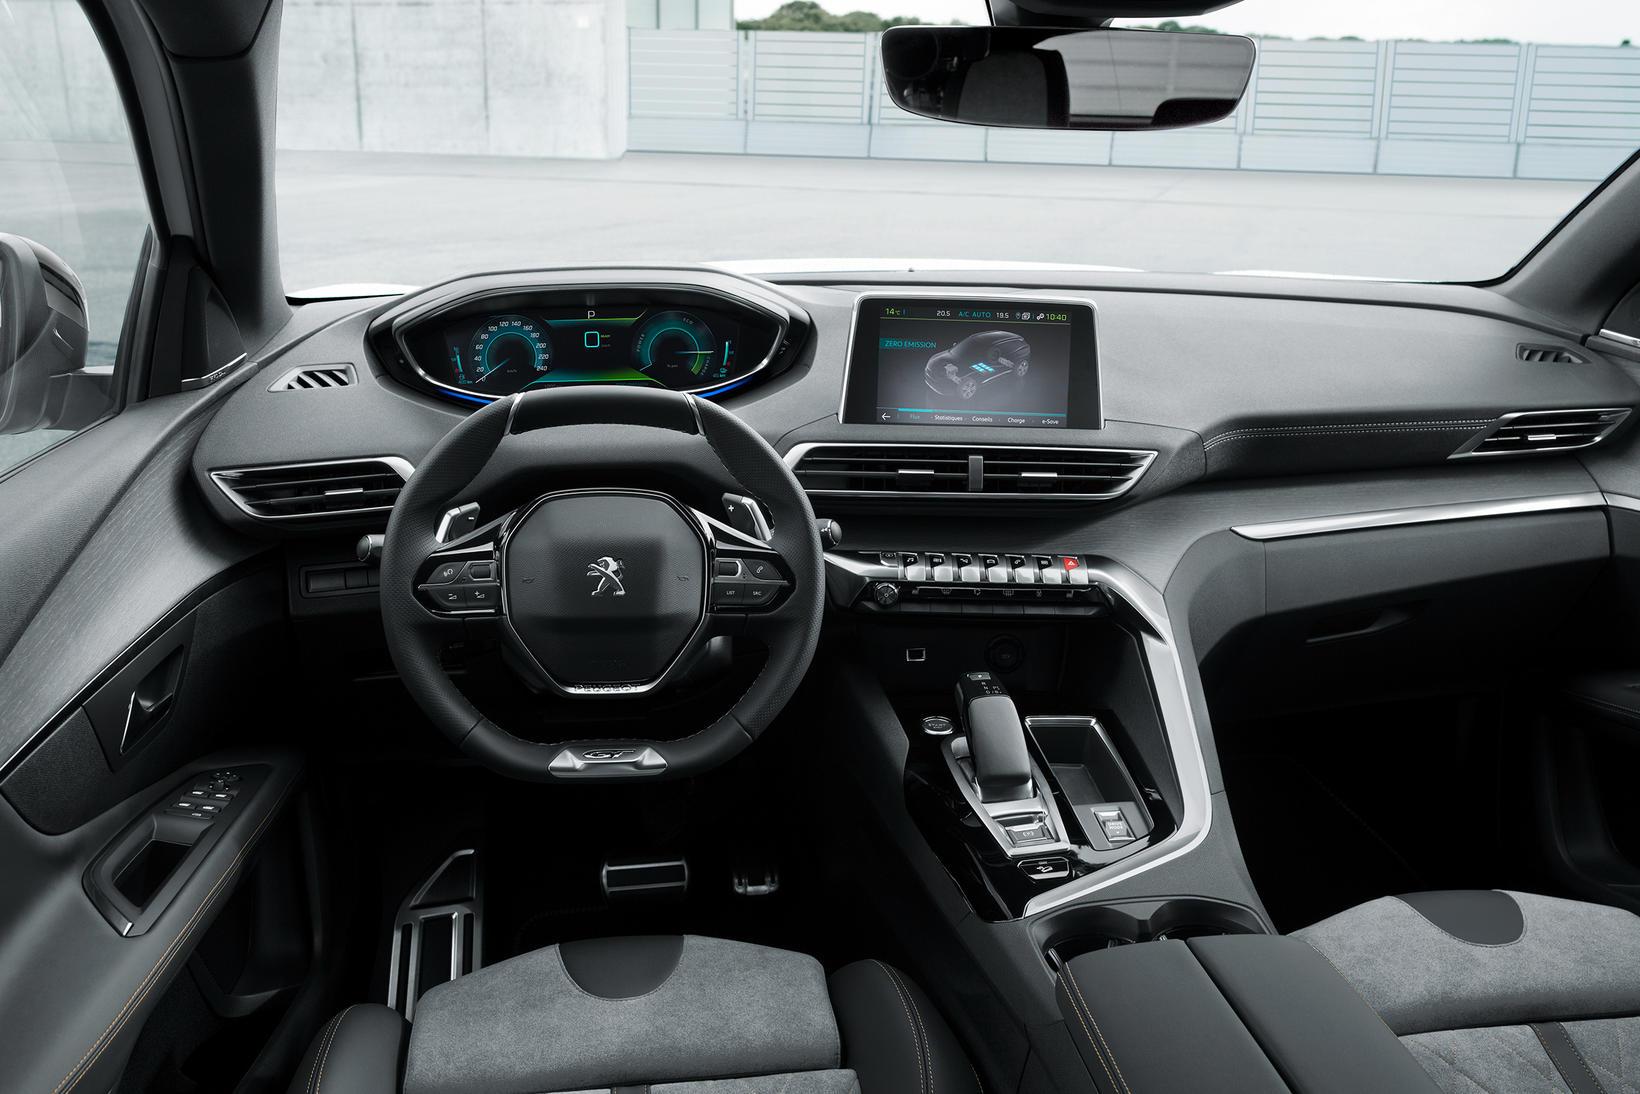 Tengiltvinnbíllinn Peugeot 3008 PHEV.